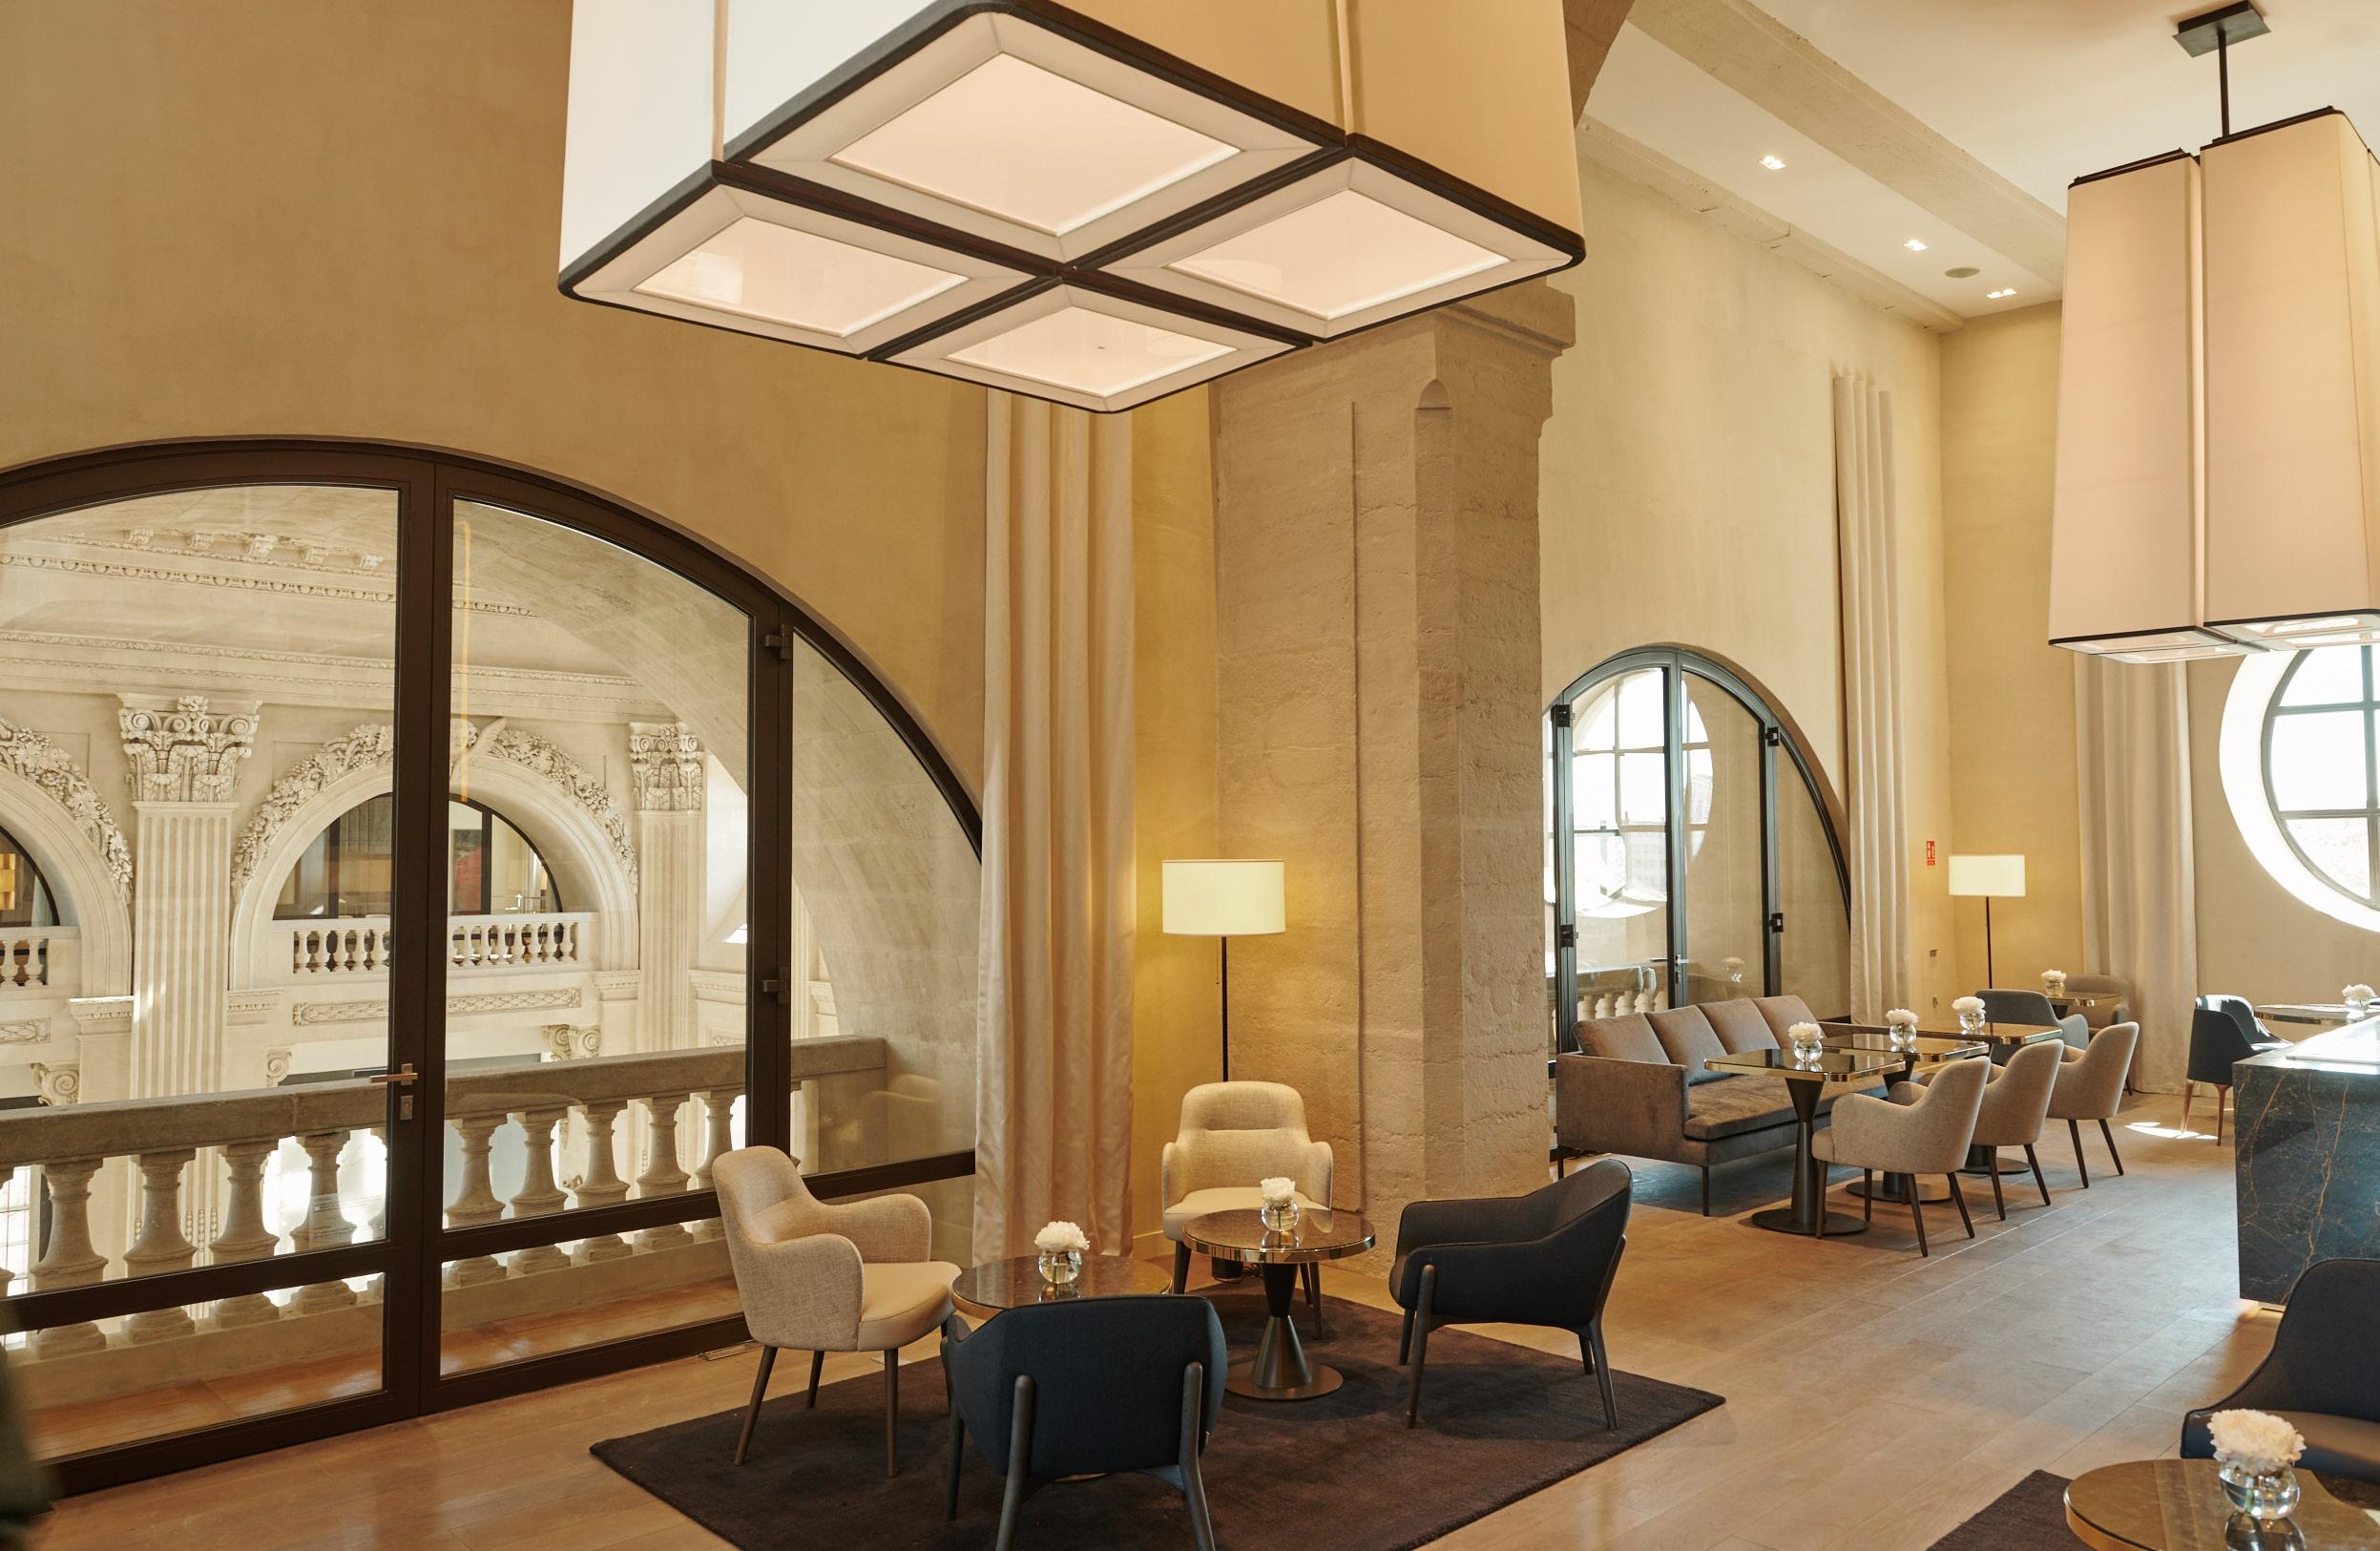 InterContinental Lyon - Hotel Dieu - club lounge